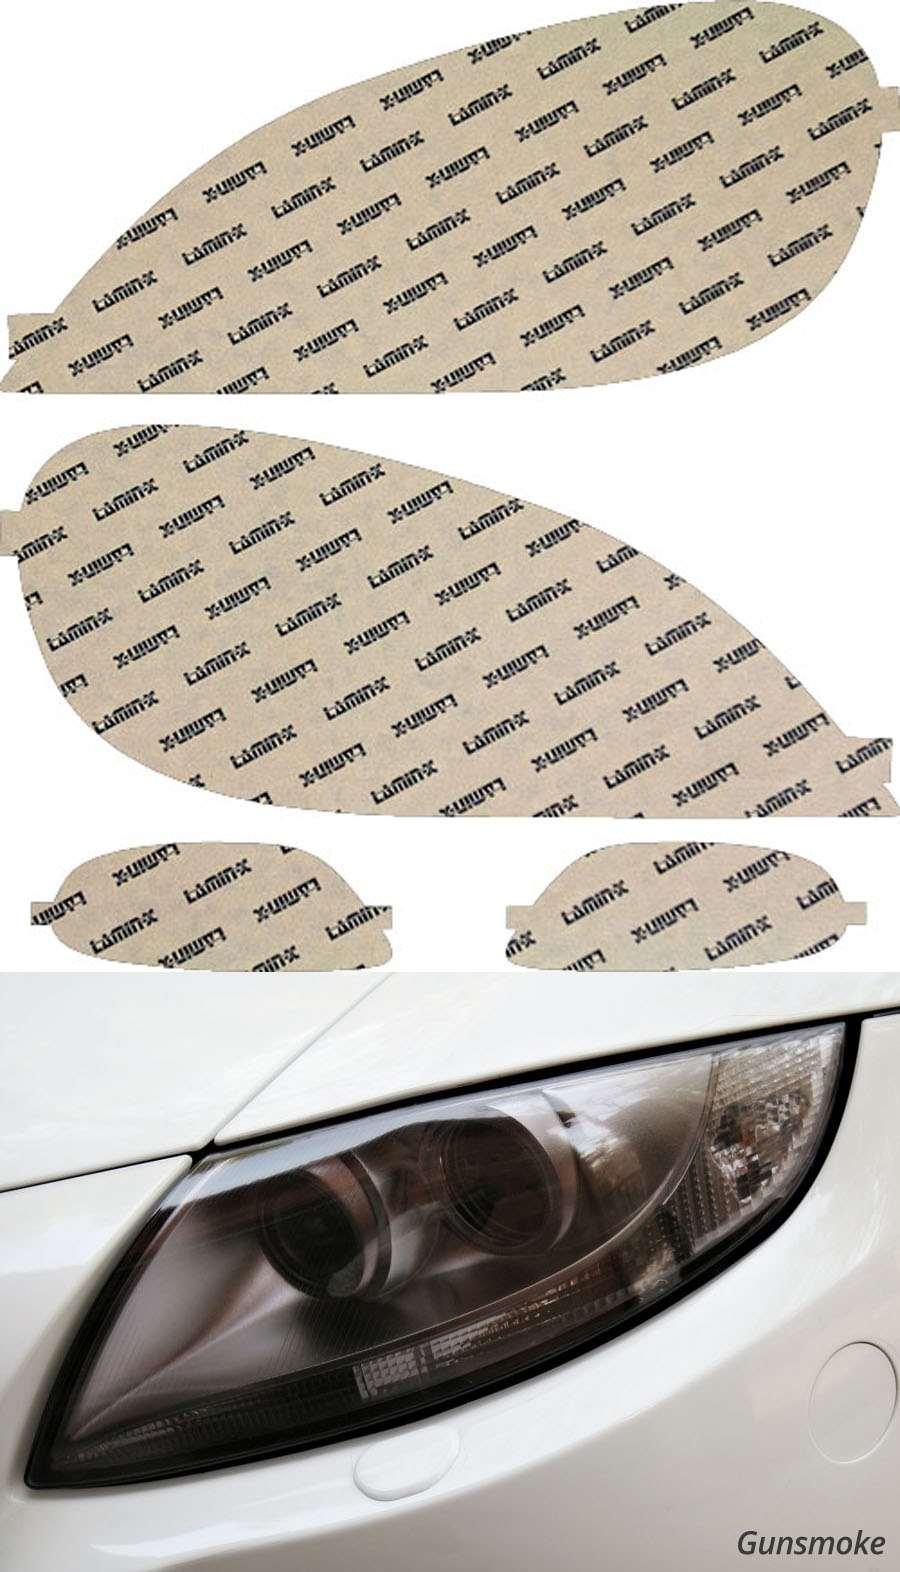 Mercedes M-Class 01-05 Gunsmoke Headlight Covers Lamin-X MB011G